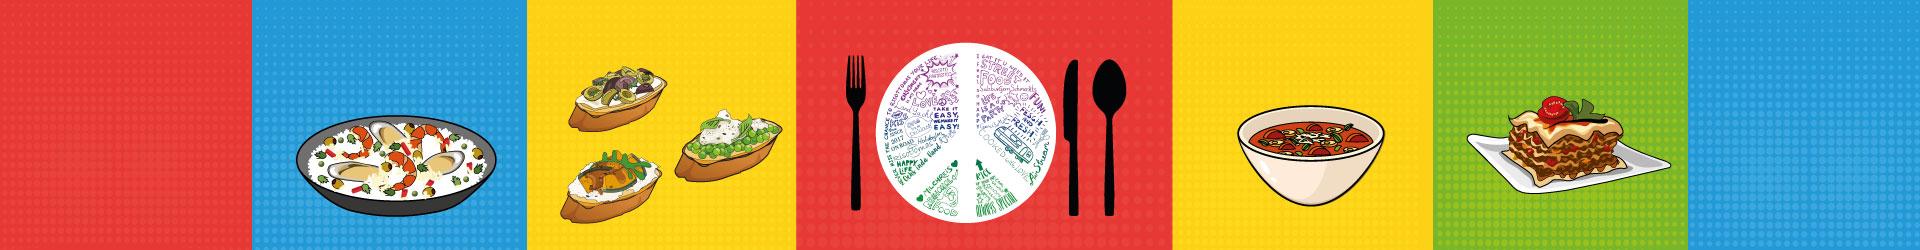 Foodtruck Risottomas Salzburg - Catering & gesundes Mittagessen